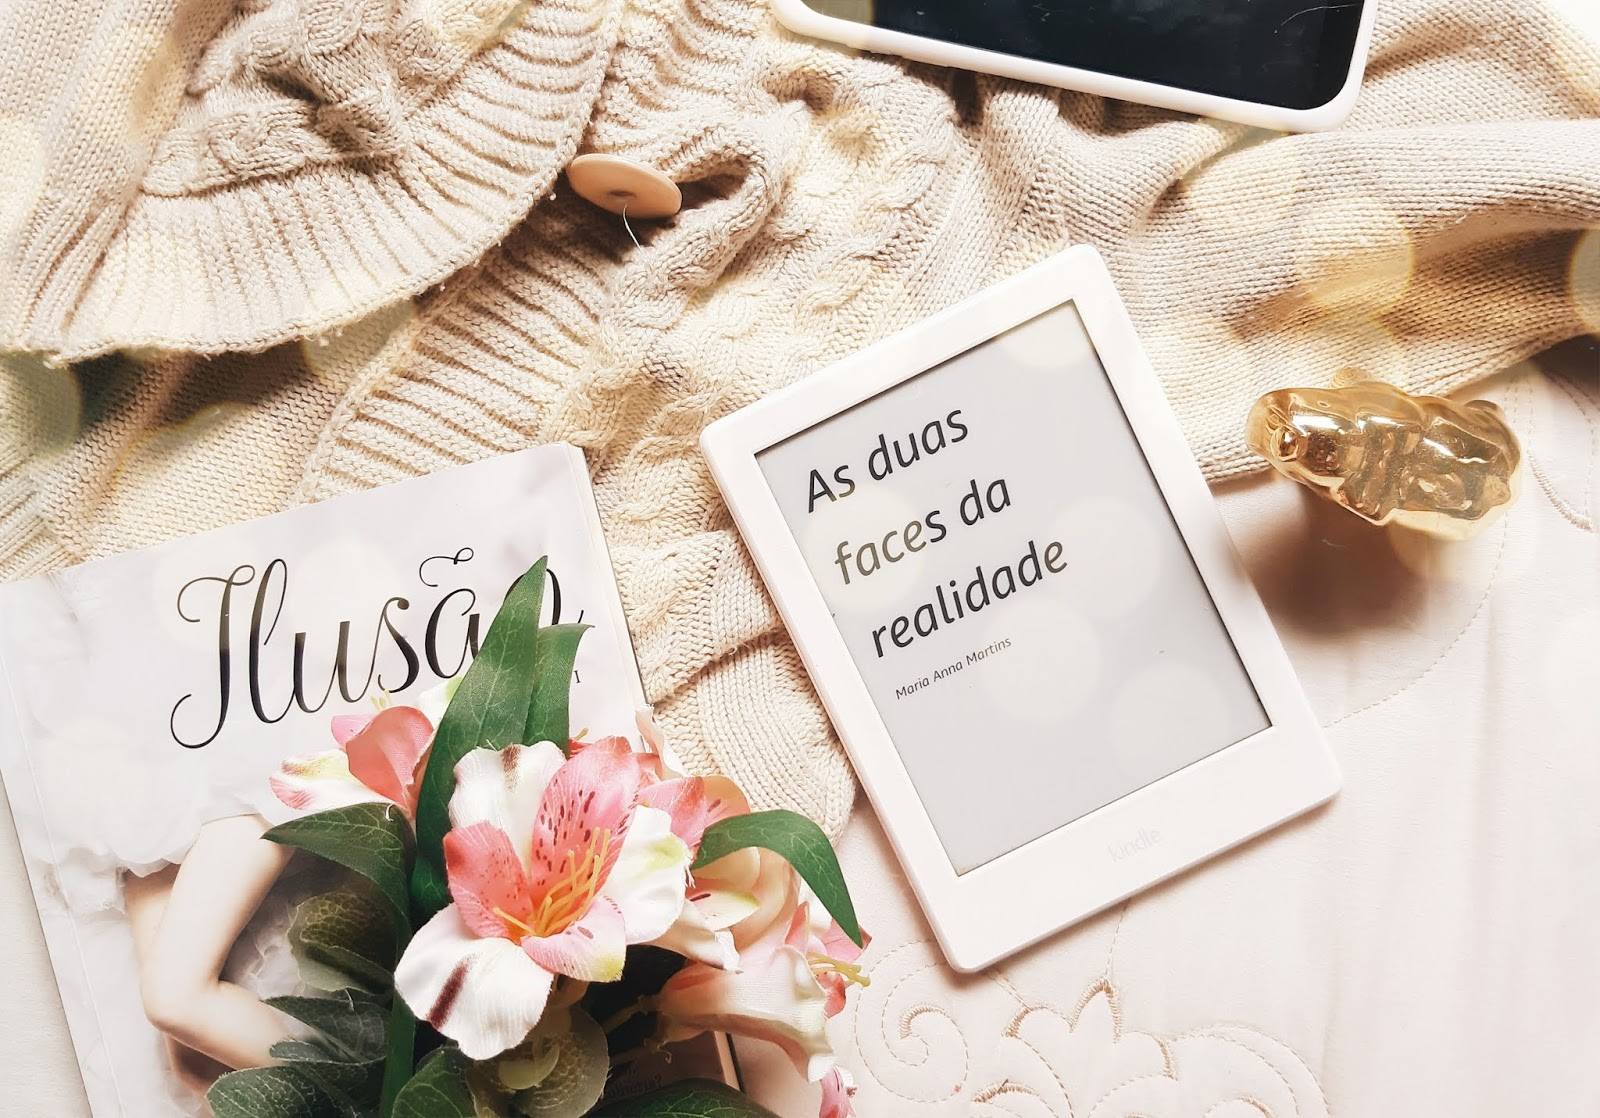 As duas faces da realidade - Maria Anna Martins | Resenha